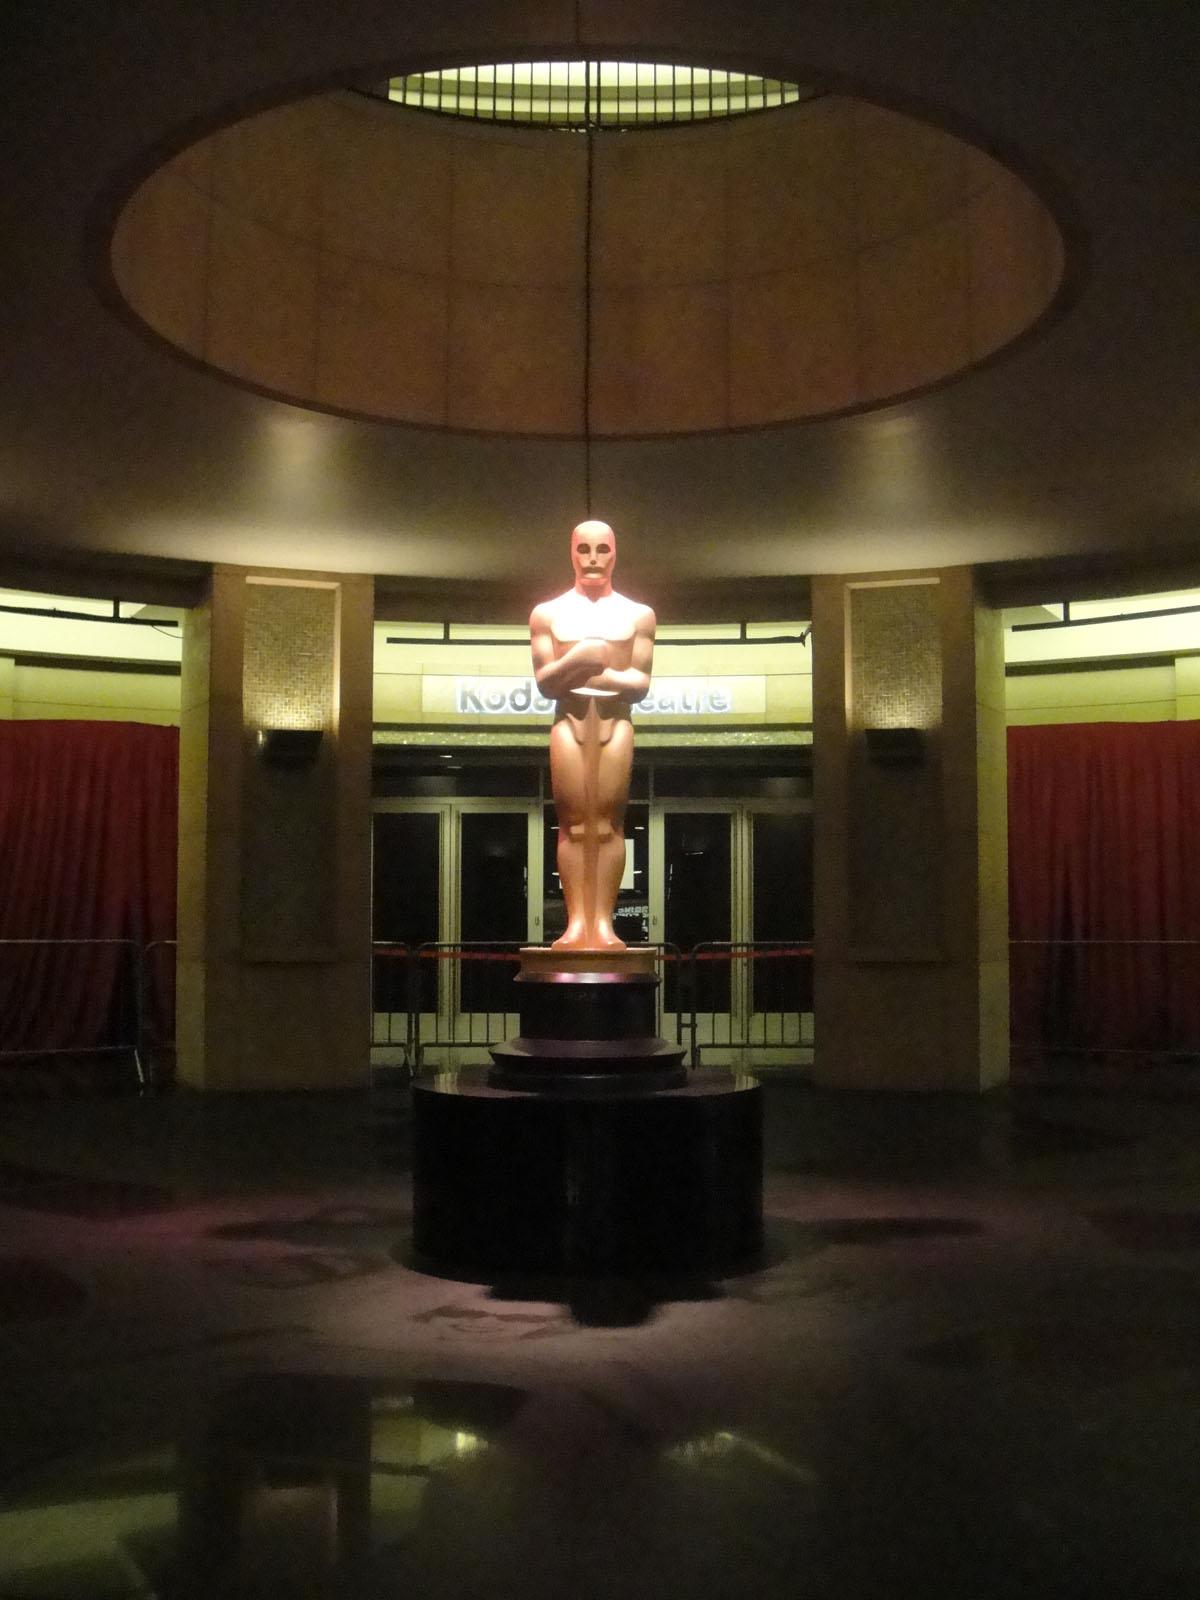 Preparing for the 84th Annual Academy Awards - giant Oscar statue (6787512754).jpg